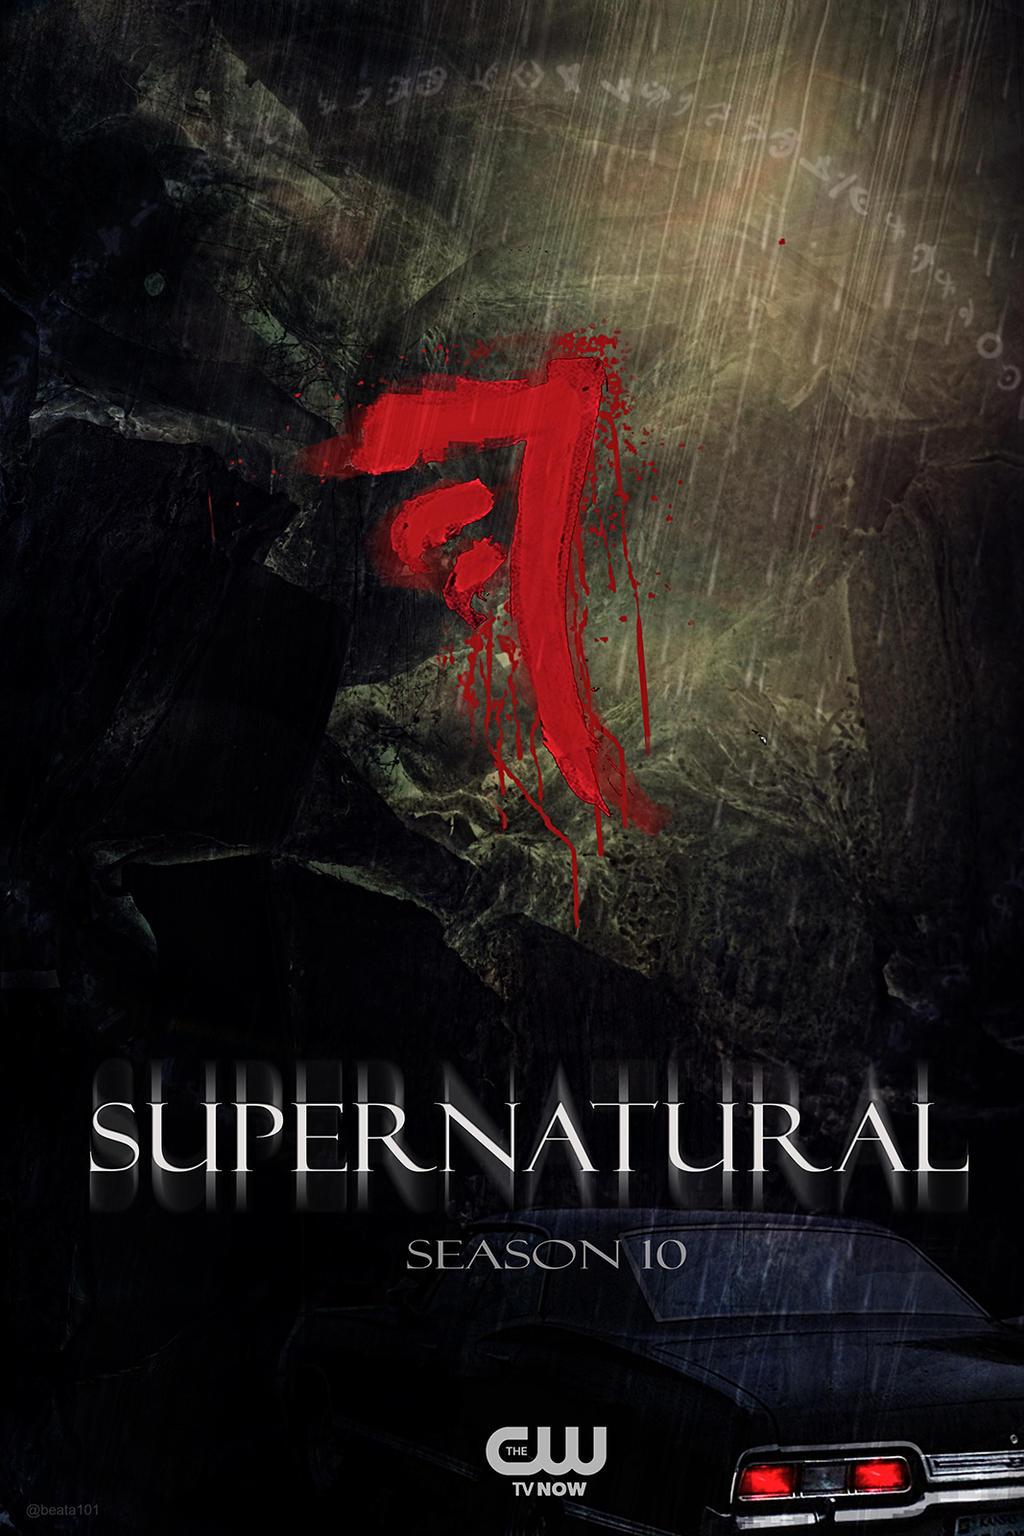 Impala Supernatural Season 10 Fan Made Poster by beata101 ...